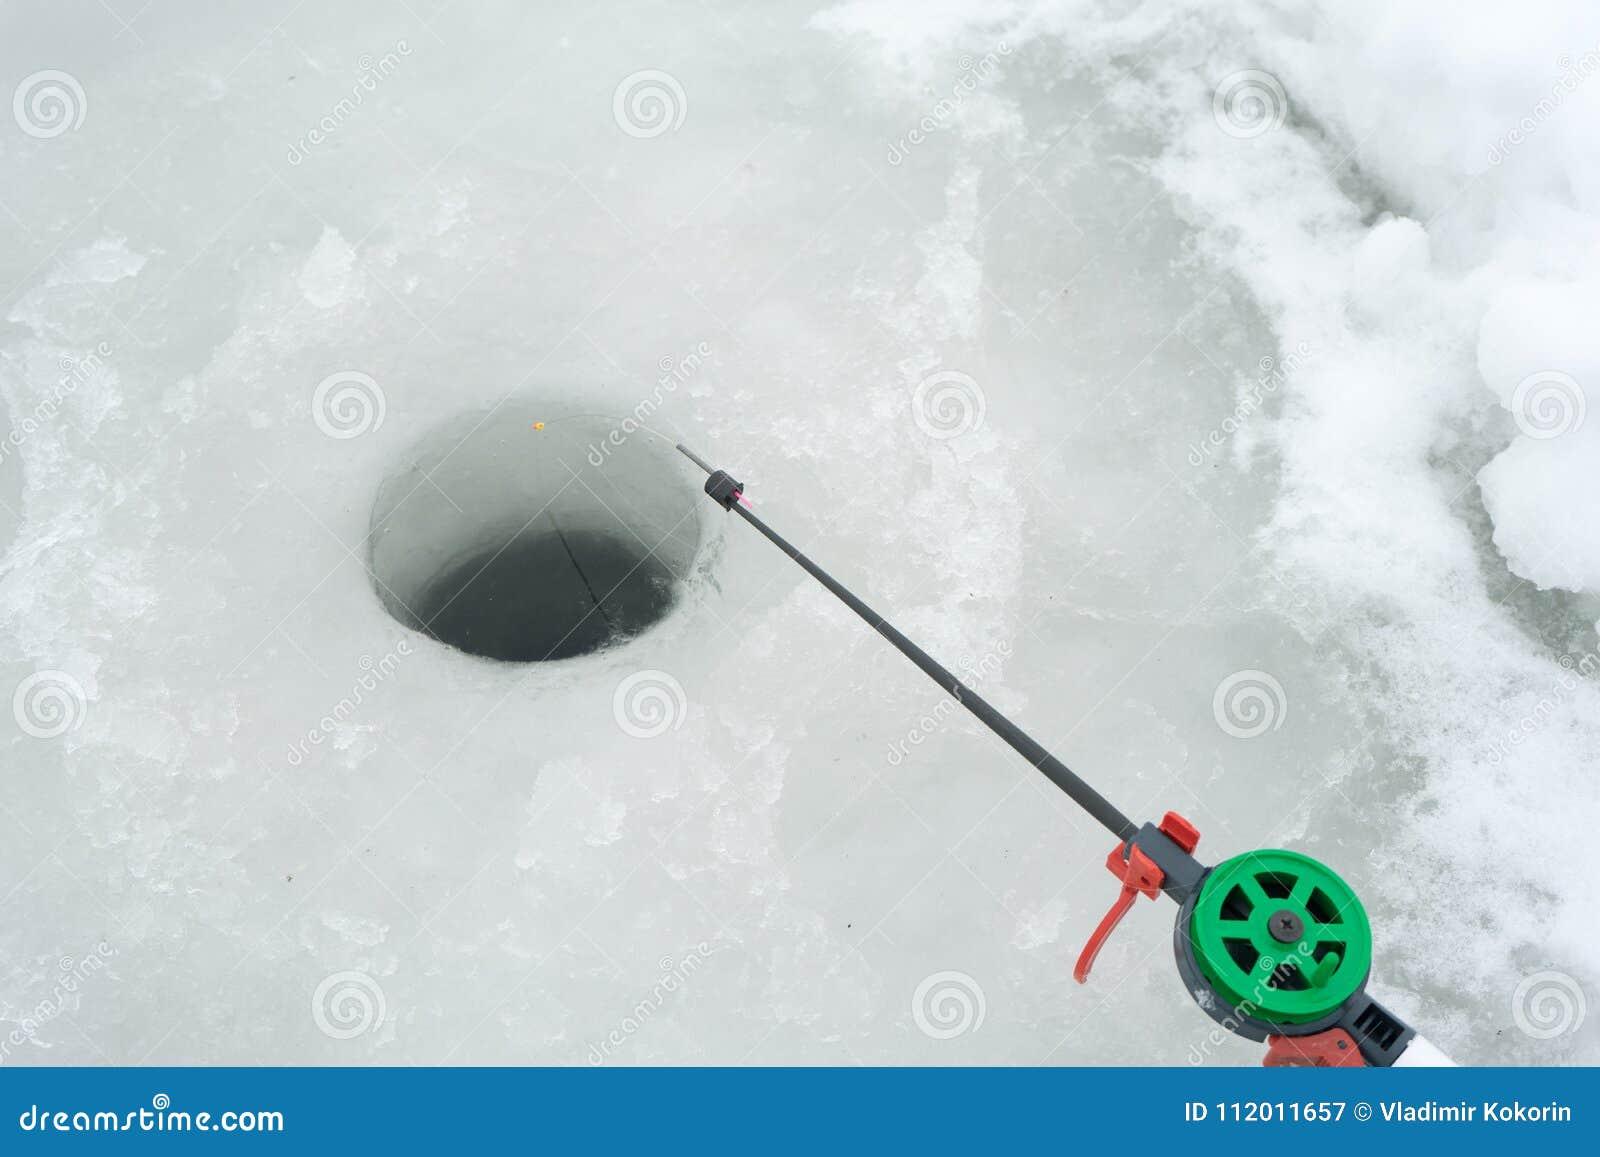 Fishing rod for winter fishing 77